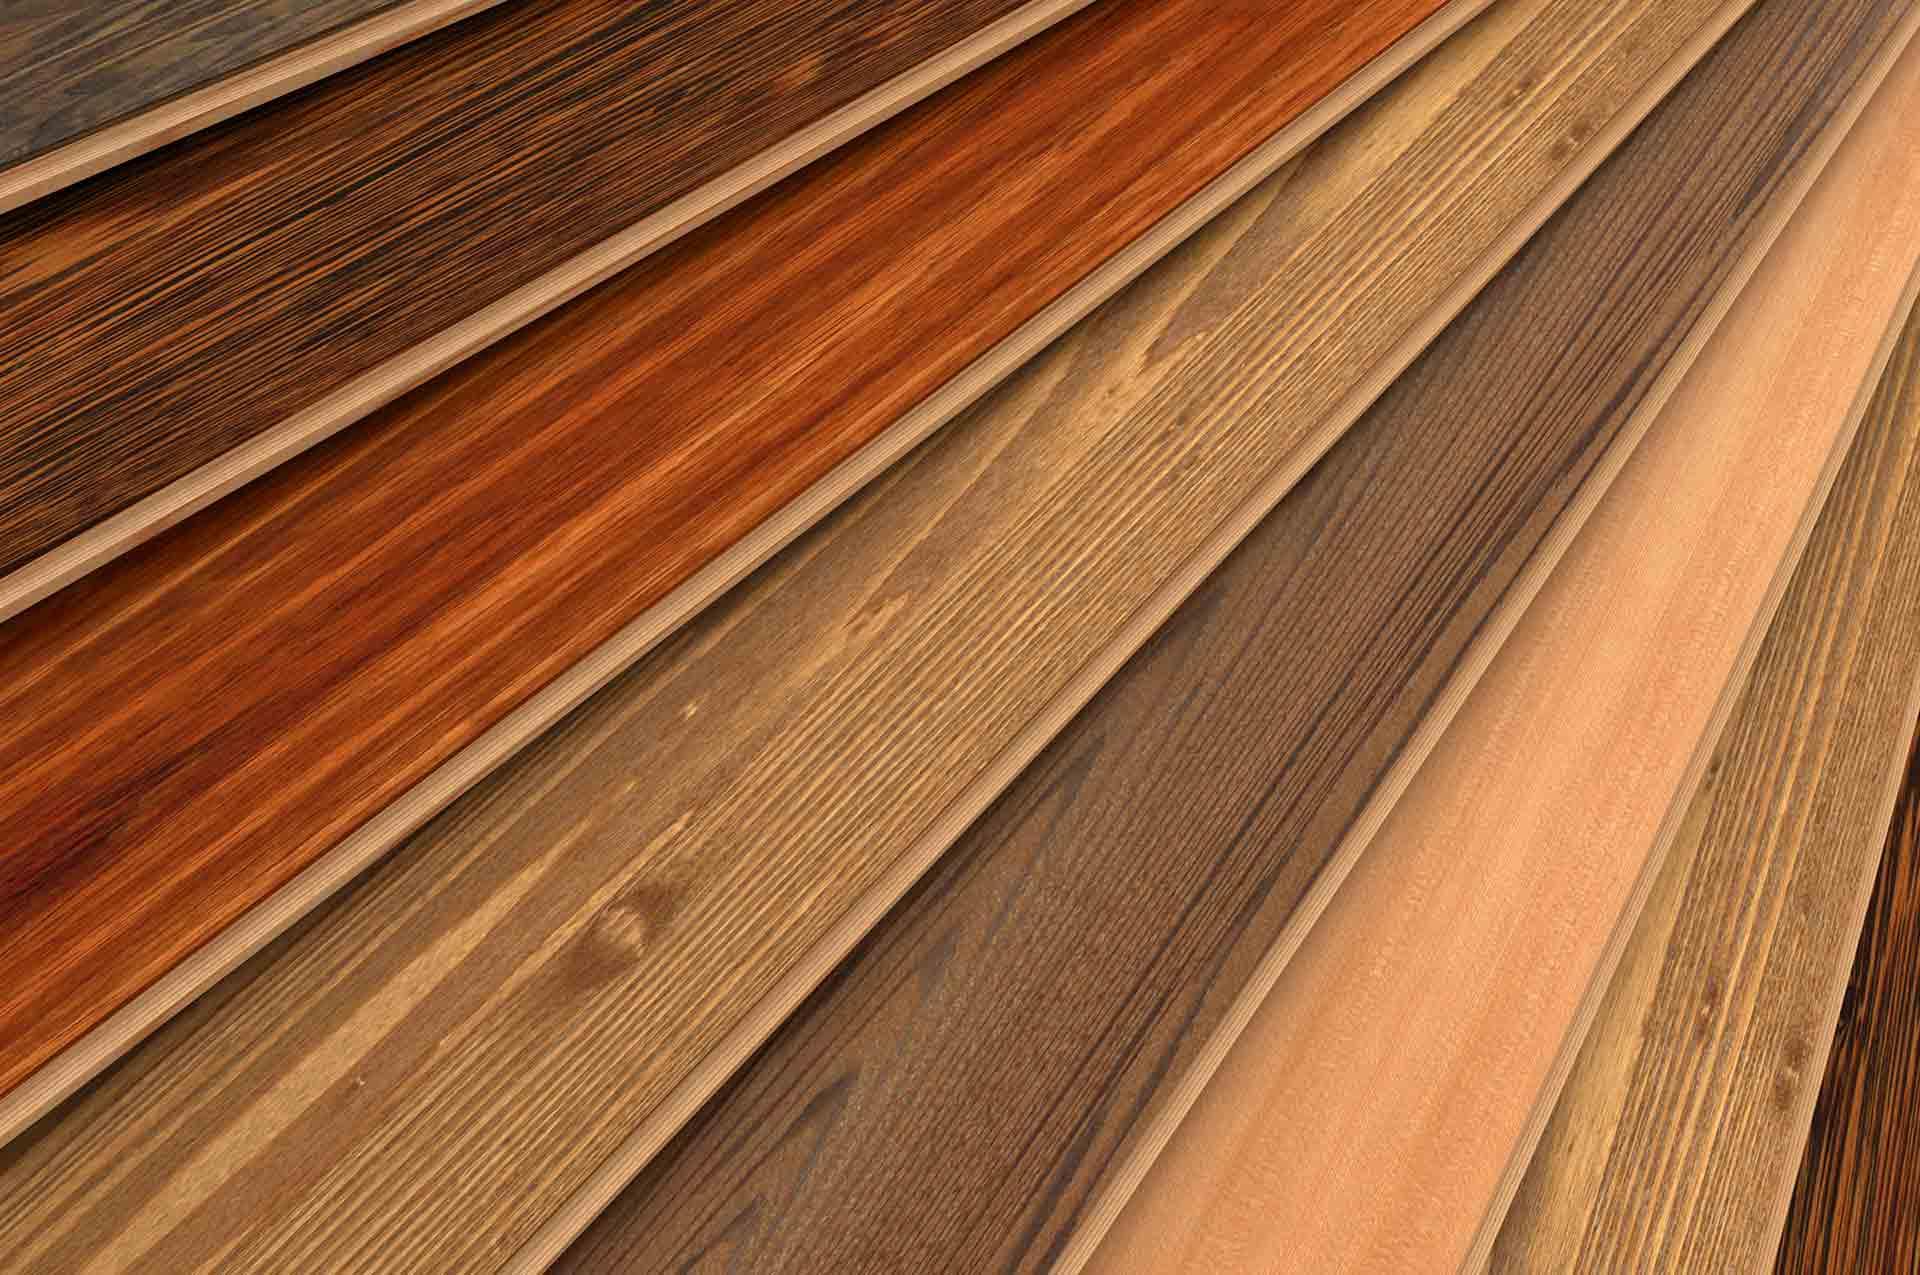 Custom wood cabinets c l design specialists inc for Hardwood floors everett wa